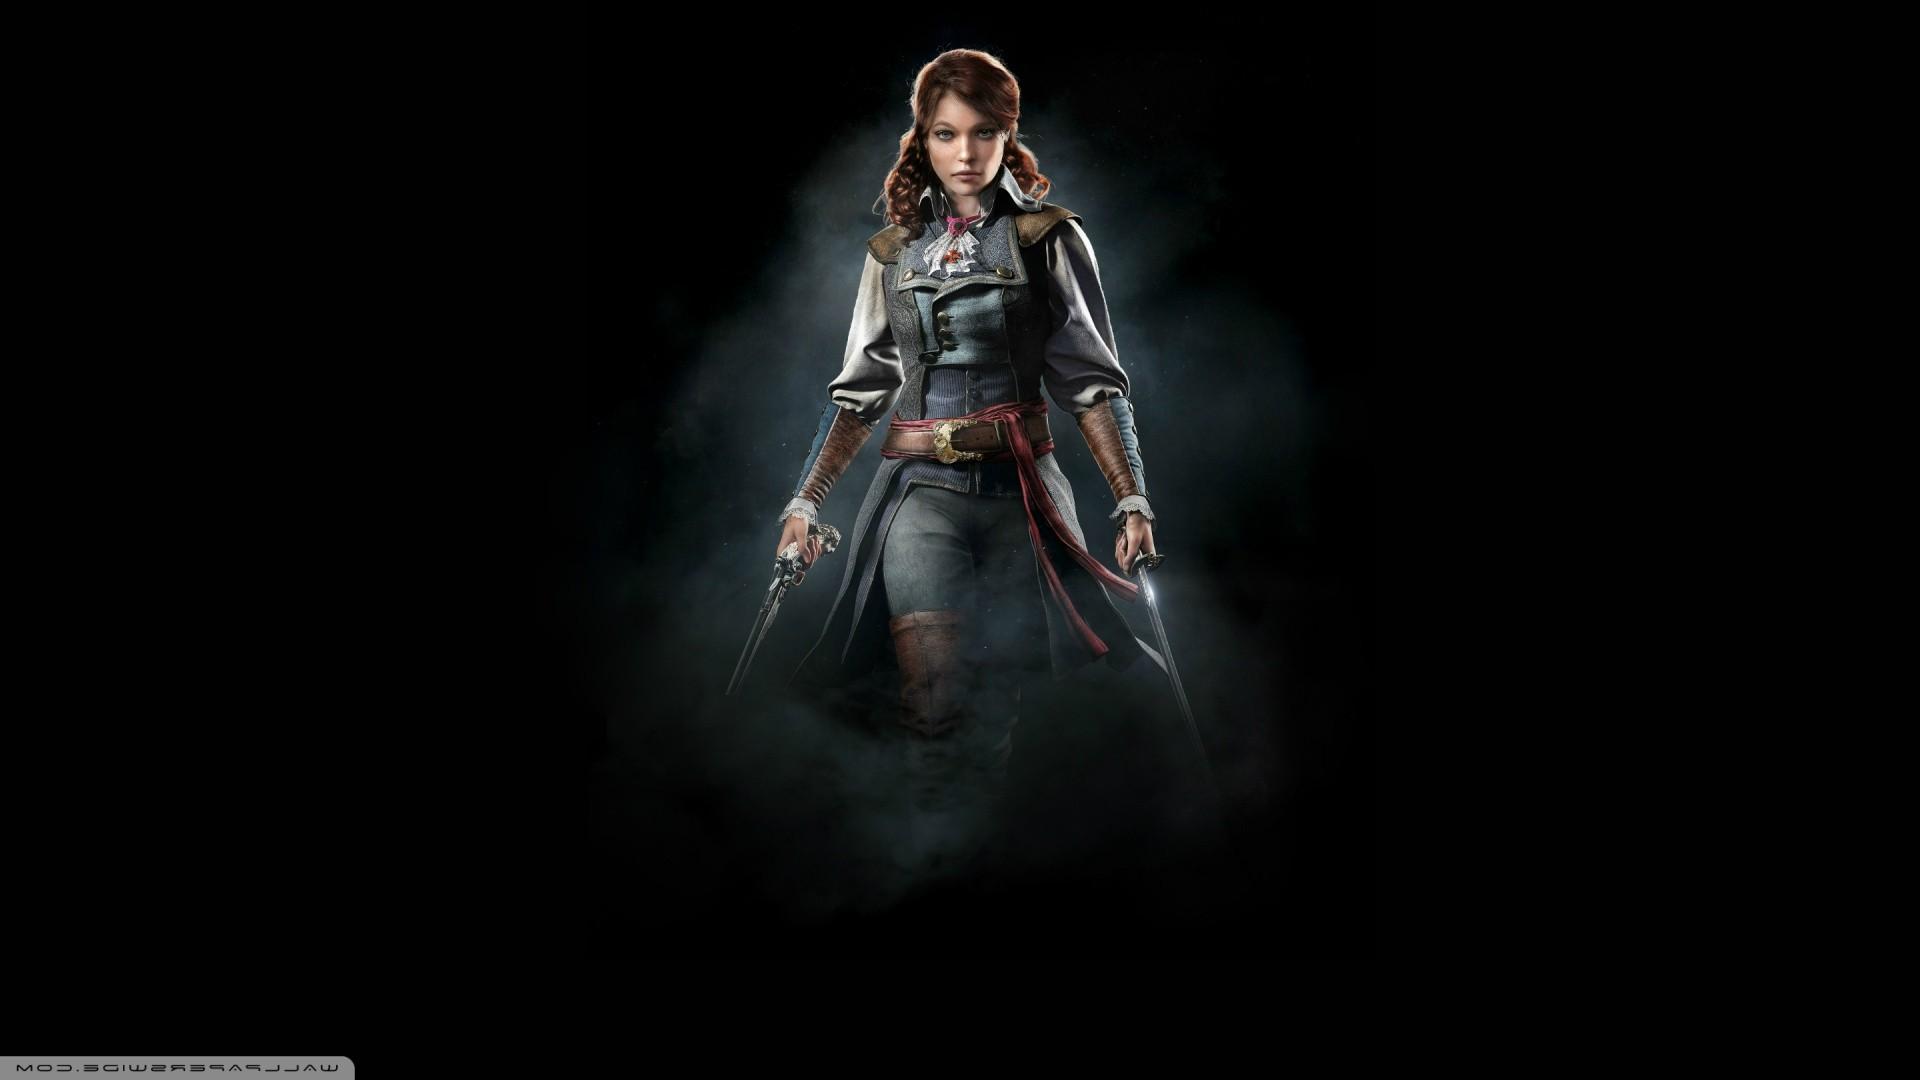 Wallpaper Video Games Ubisoft Darkness Screenshot 1920x1080